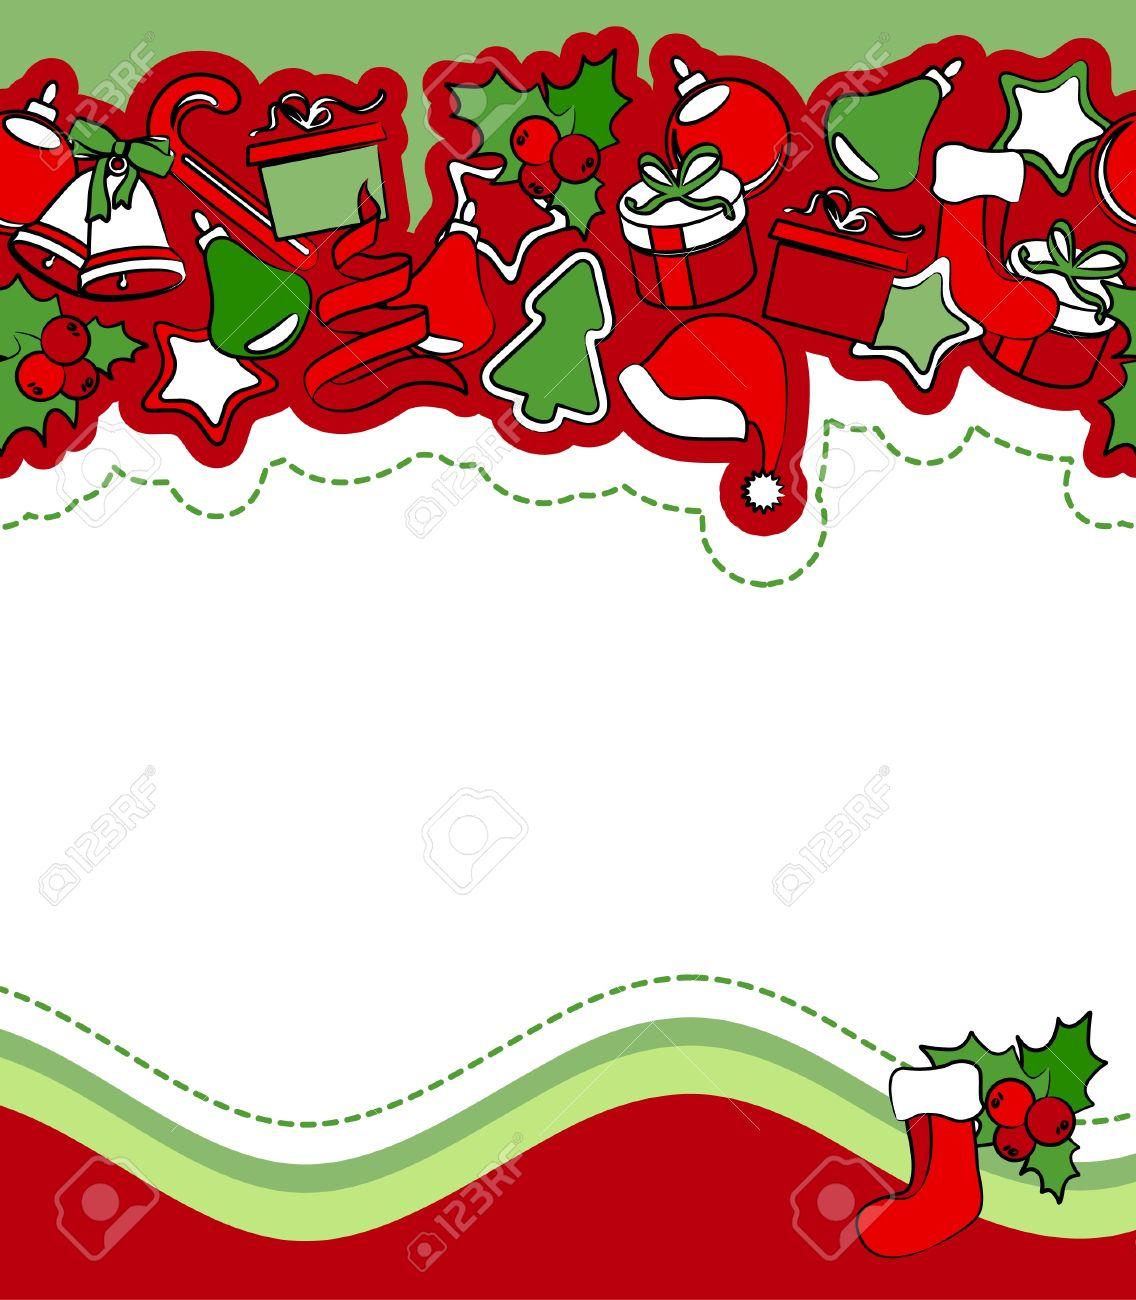 Christmas Greeting Card Royalty Free Cliparts, Vectors, And Stock ...